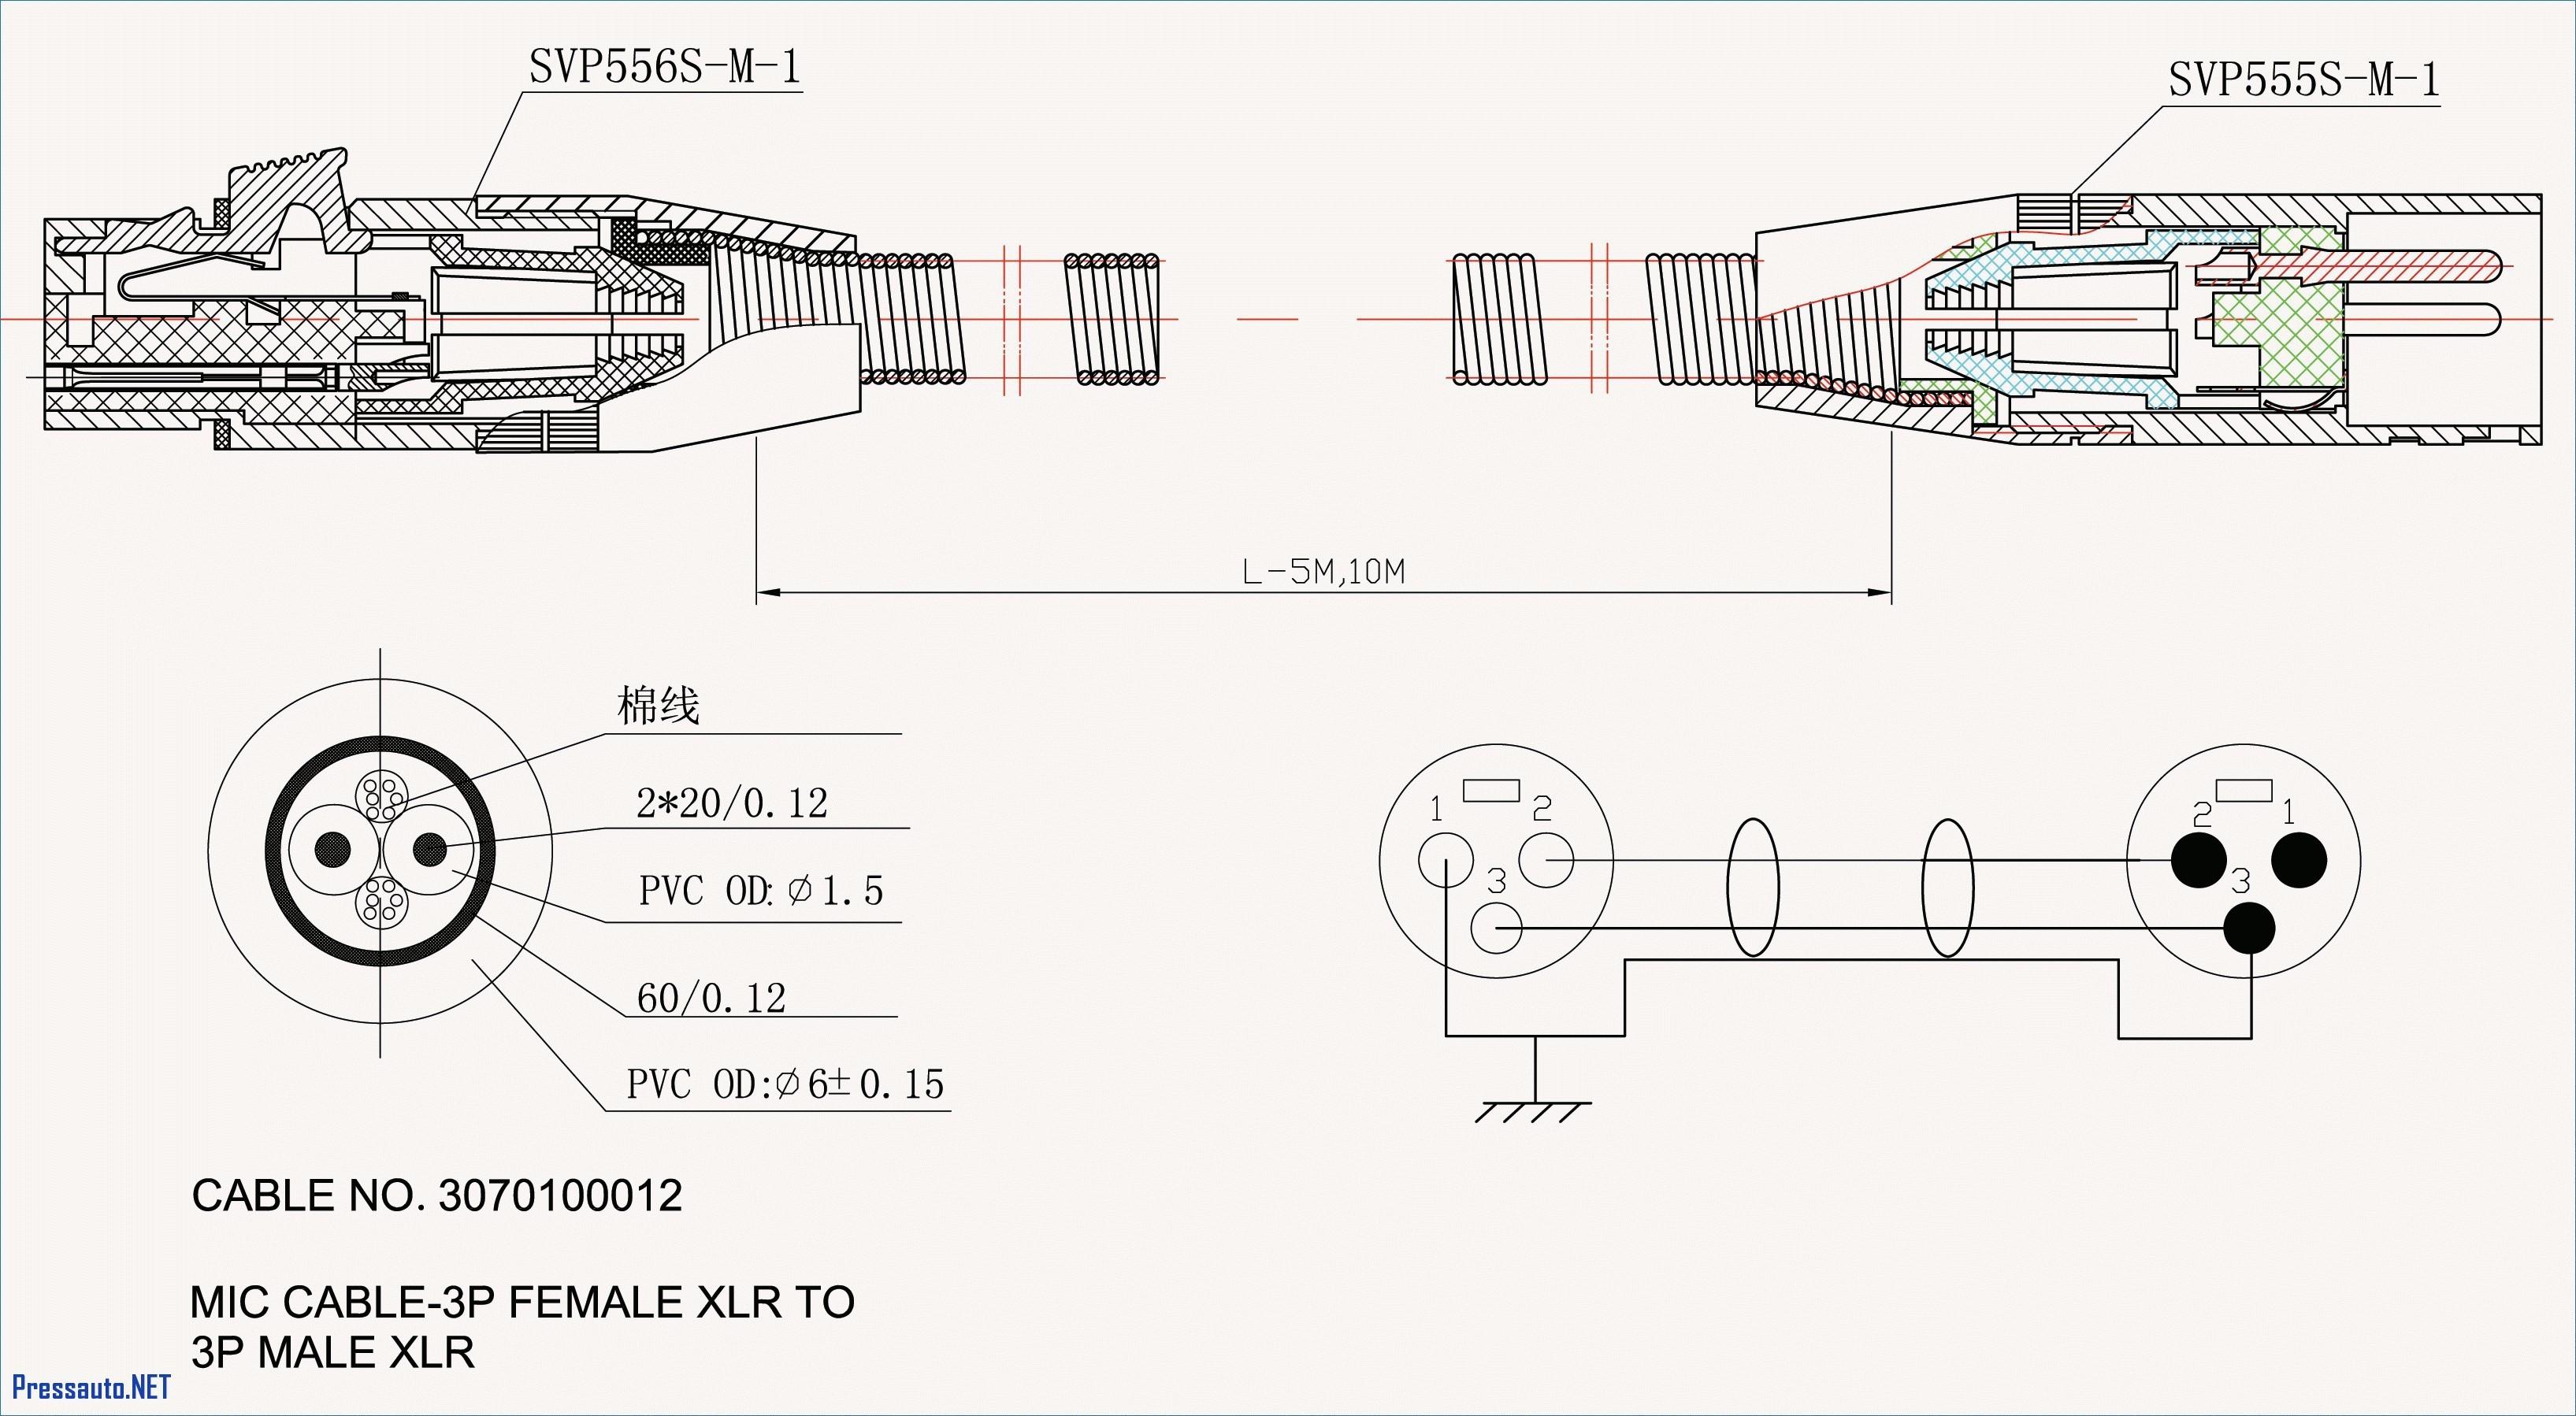 Enclosed Trailer Wiring Diagram Elegant Wiring Diagram Junction Box Fresh Trailer Wiring Junction Box